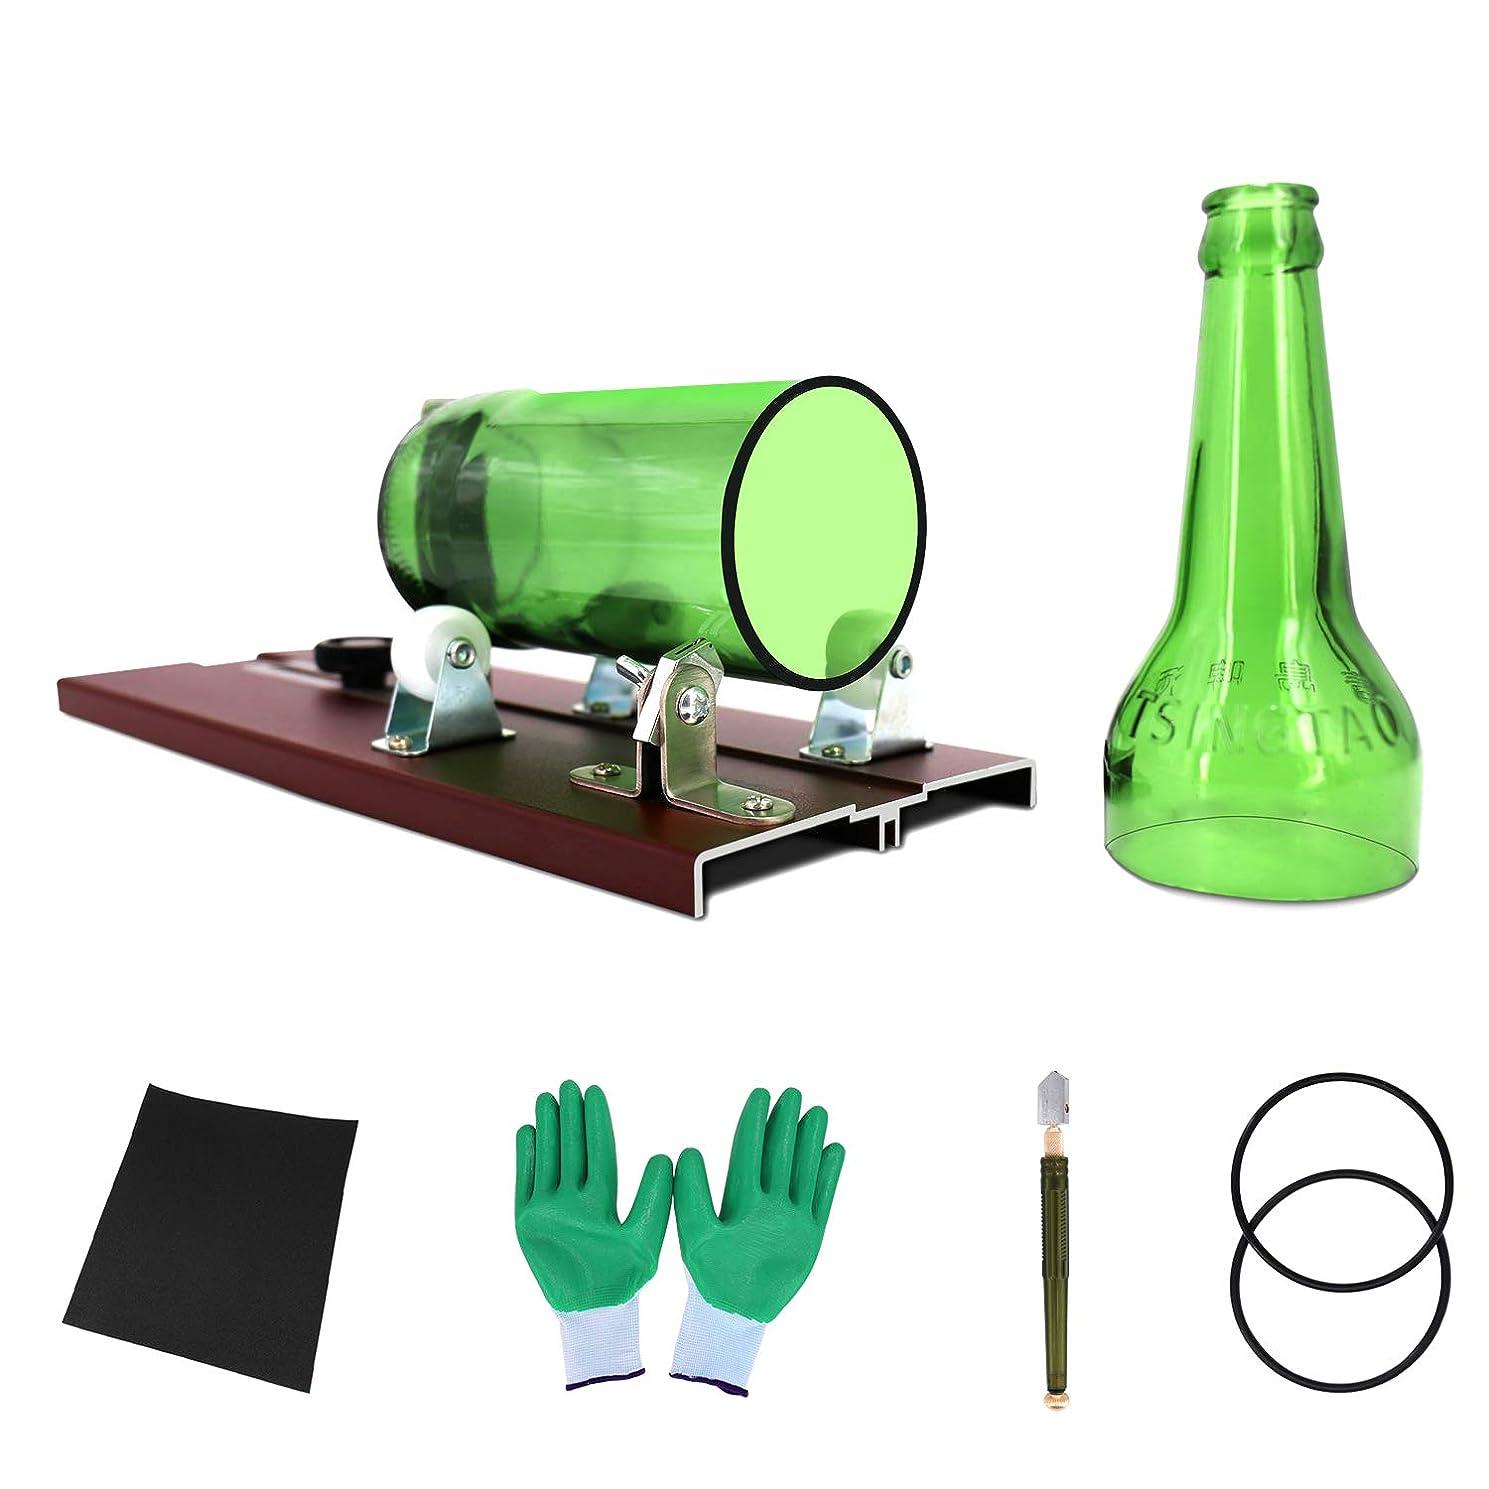 Upgrade Glass Bottle Cutter, Bottle Cutting Machine Tool Kit for Wine/Beer Bottles Cutter Crafting (Bottle)